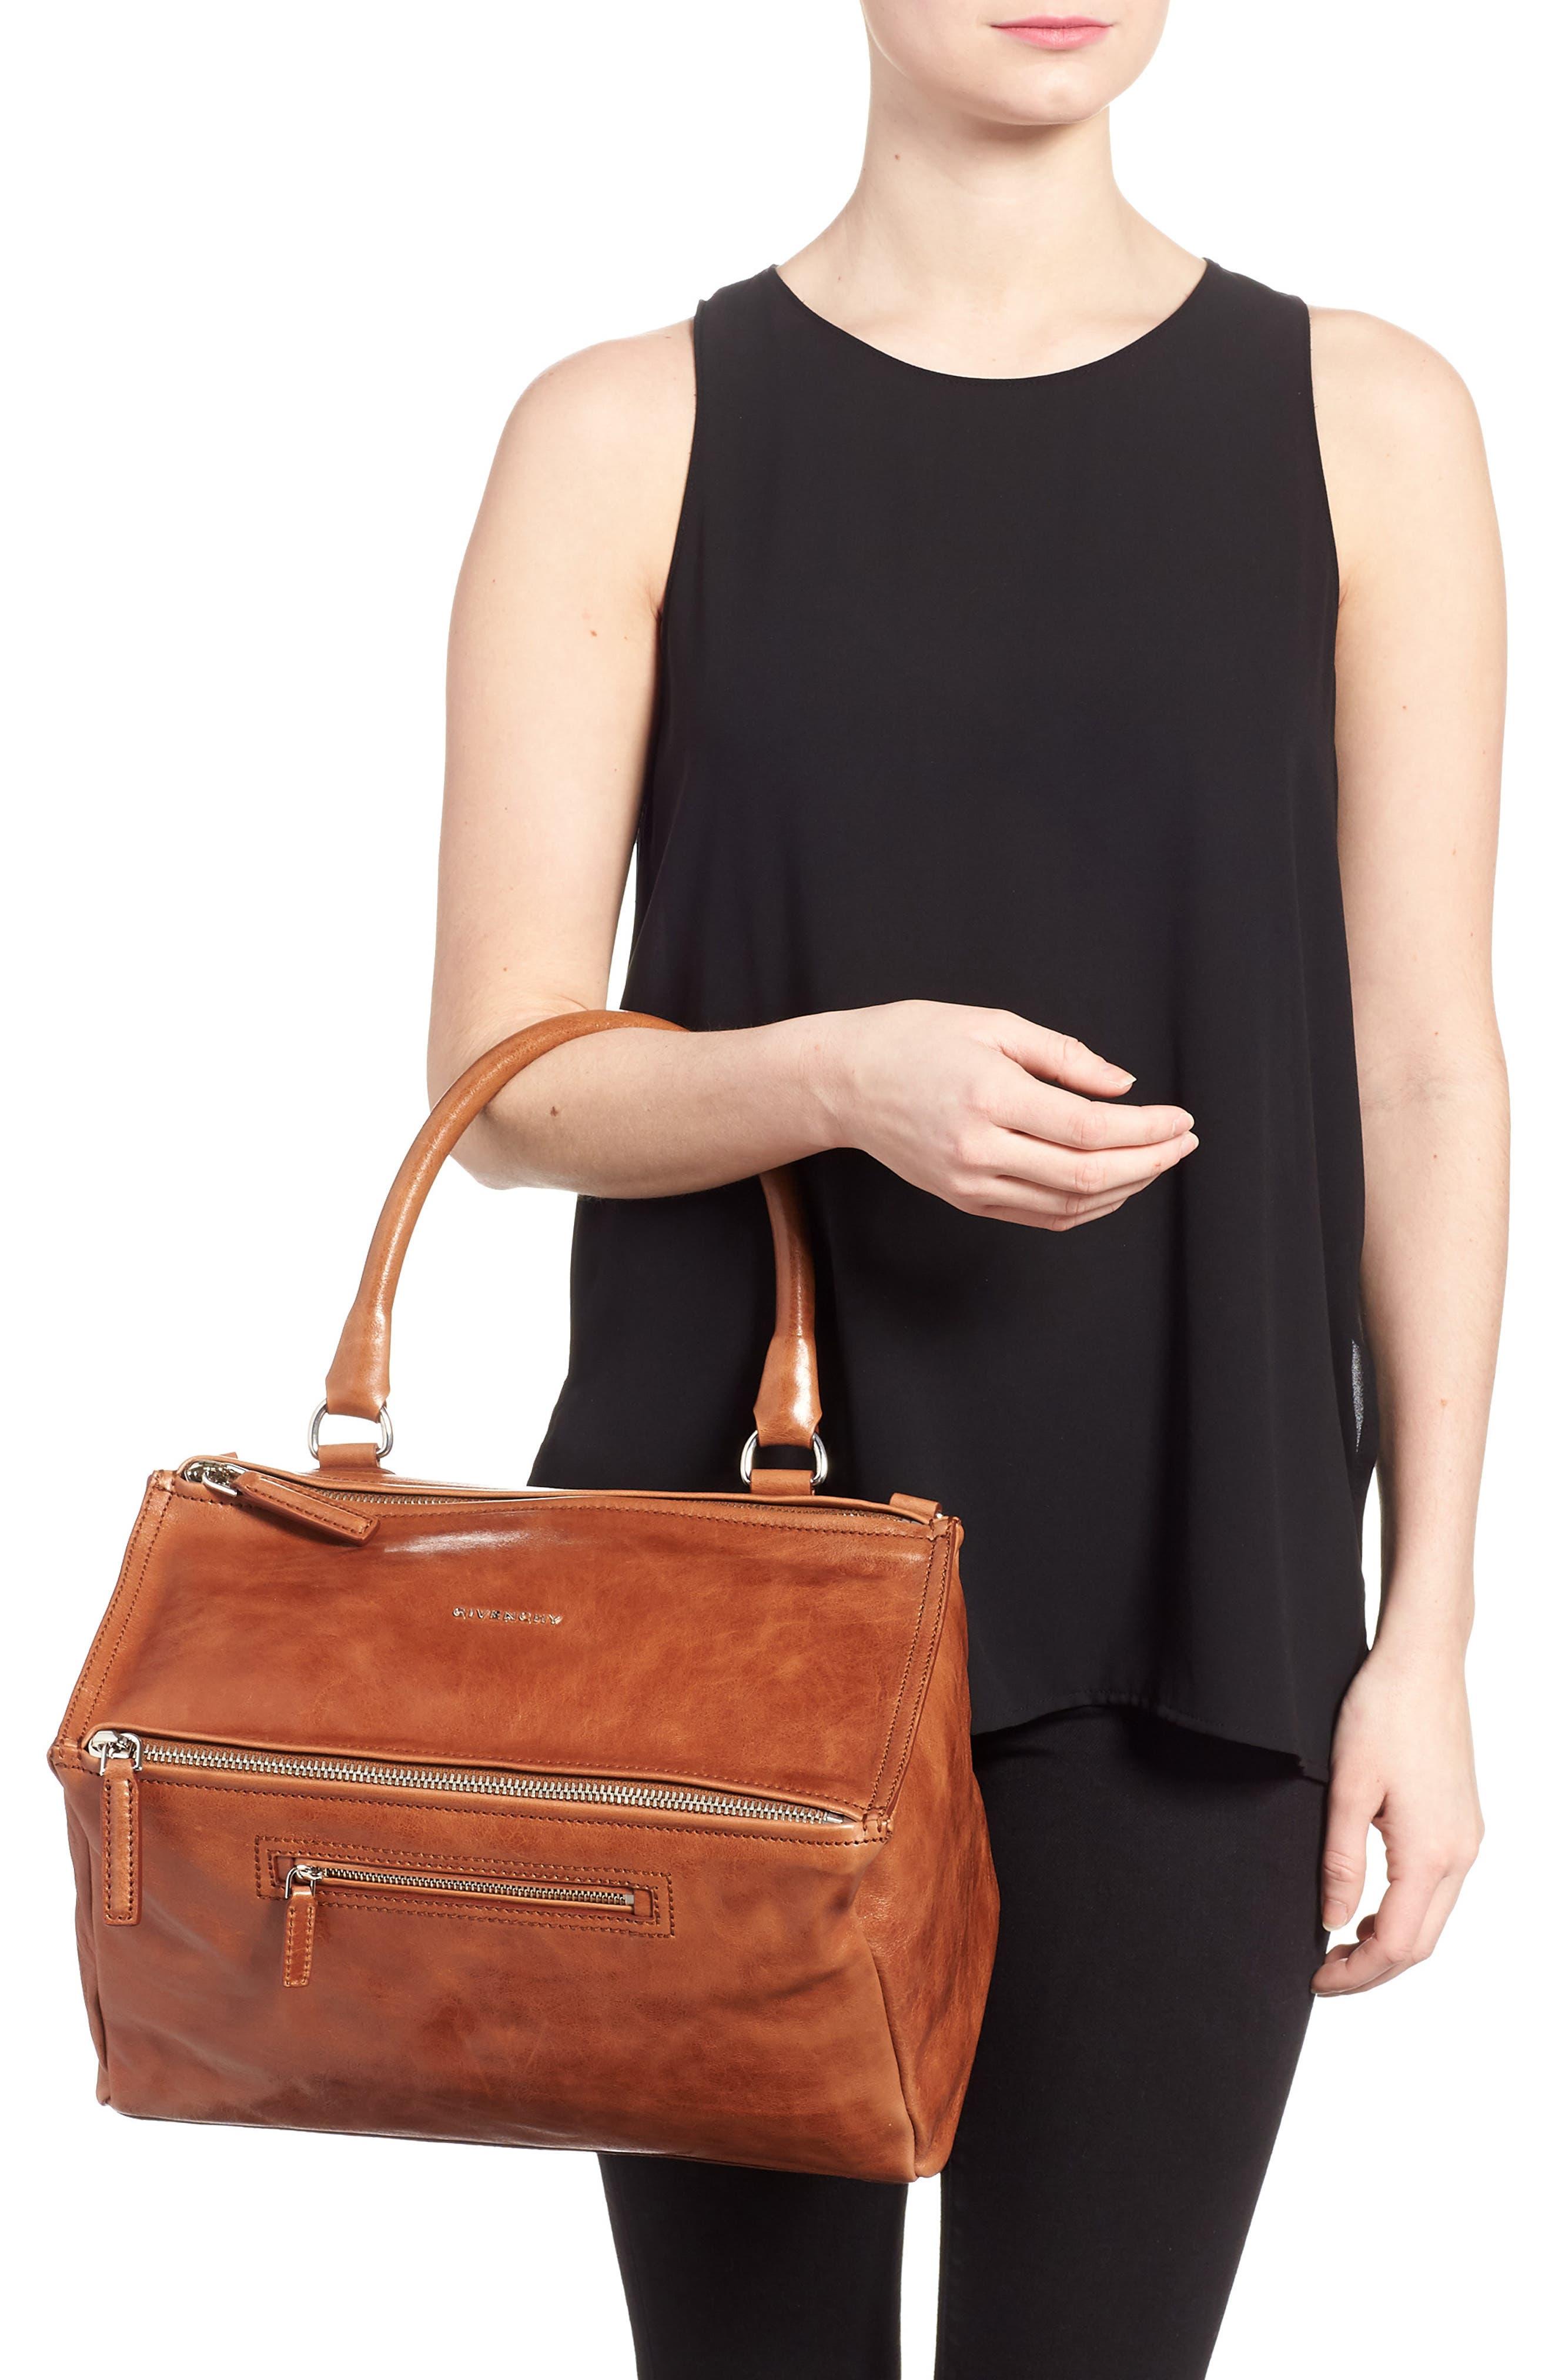 Medium Pandora Shiny Aged Leather Satchel,                             Alternate thumbnail 2, color,                             Cognac